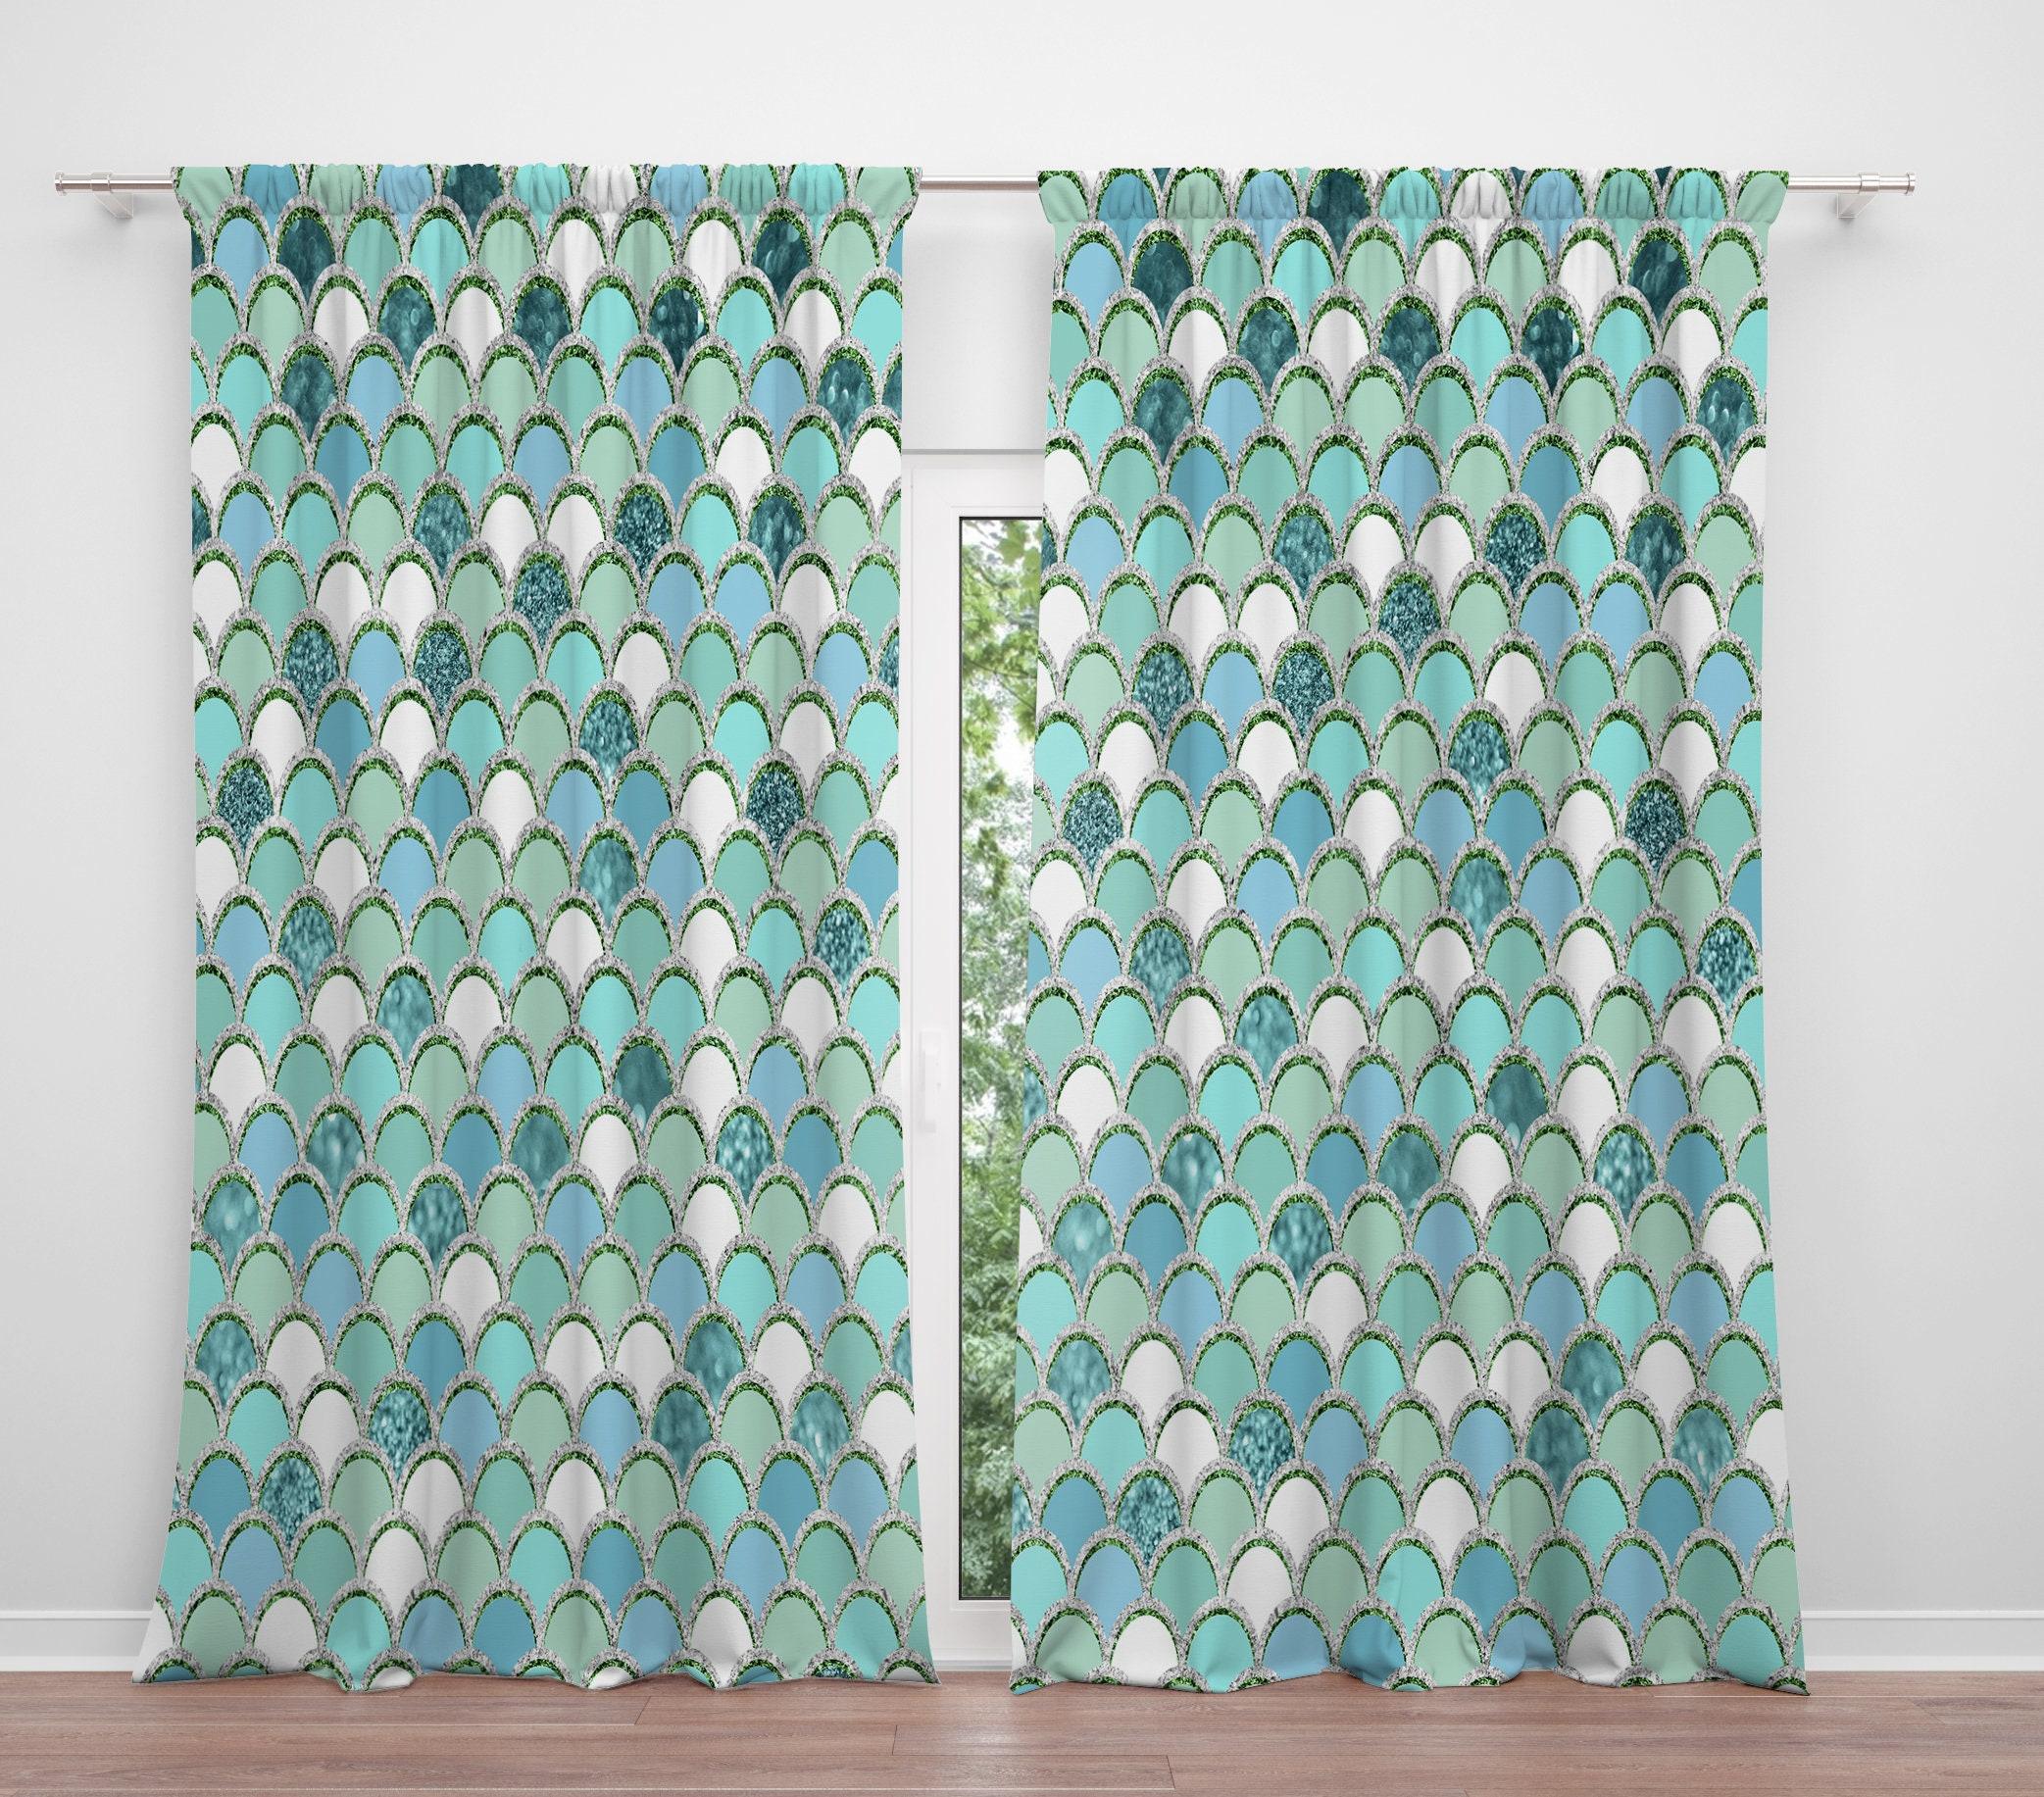 Mermaid Scales Window Curtains Sea Jewels Aqua Blue Green Long Short Valance